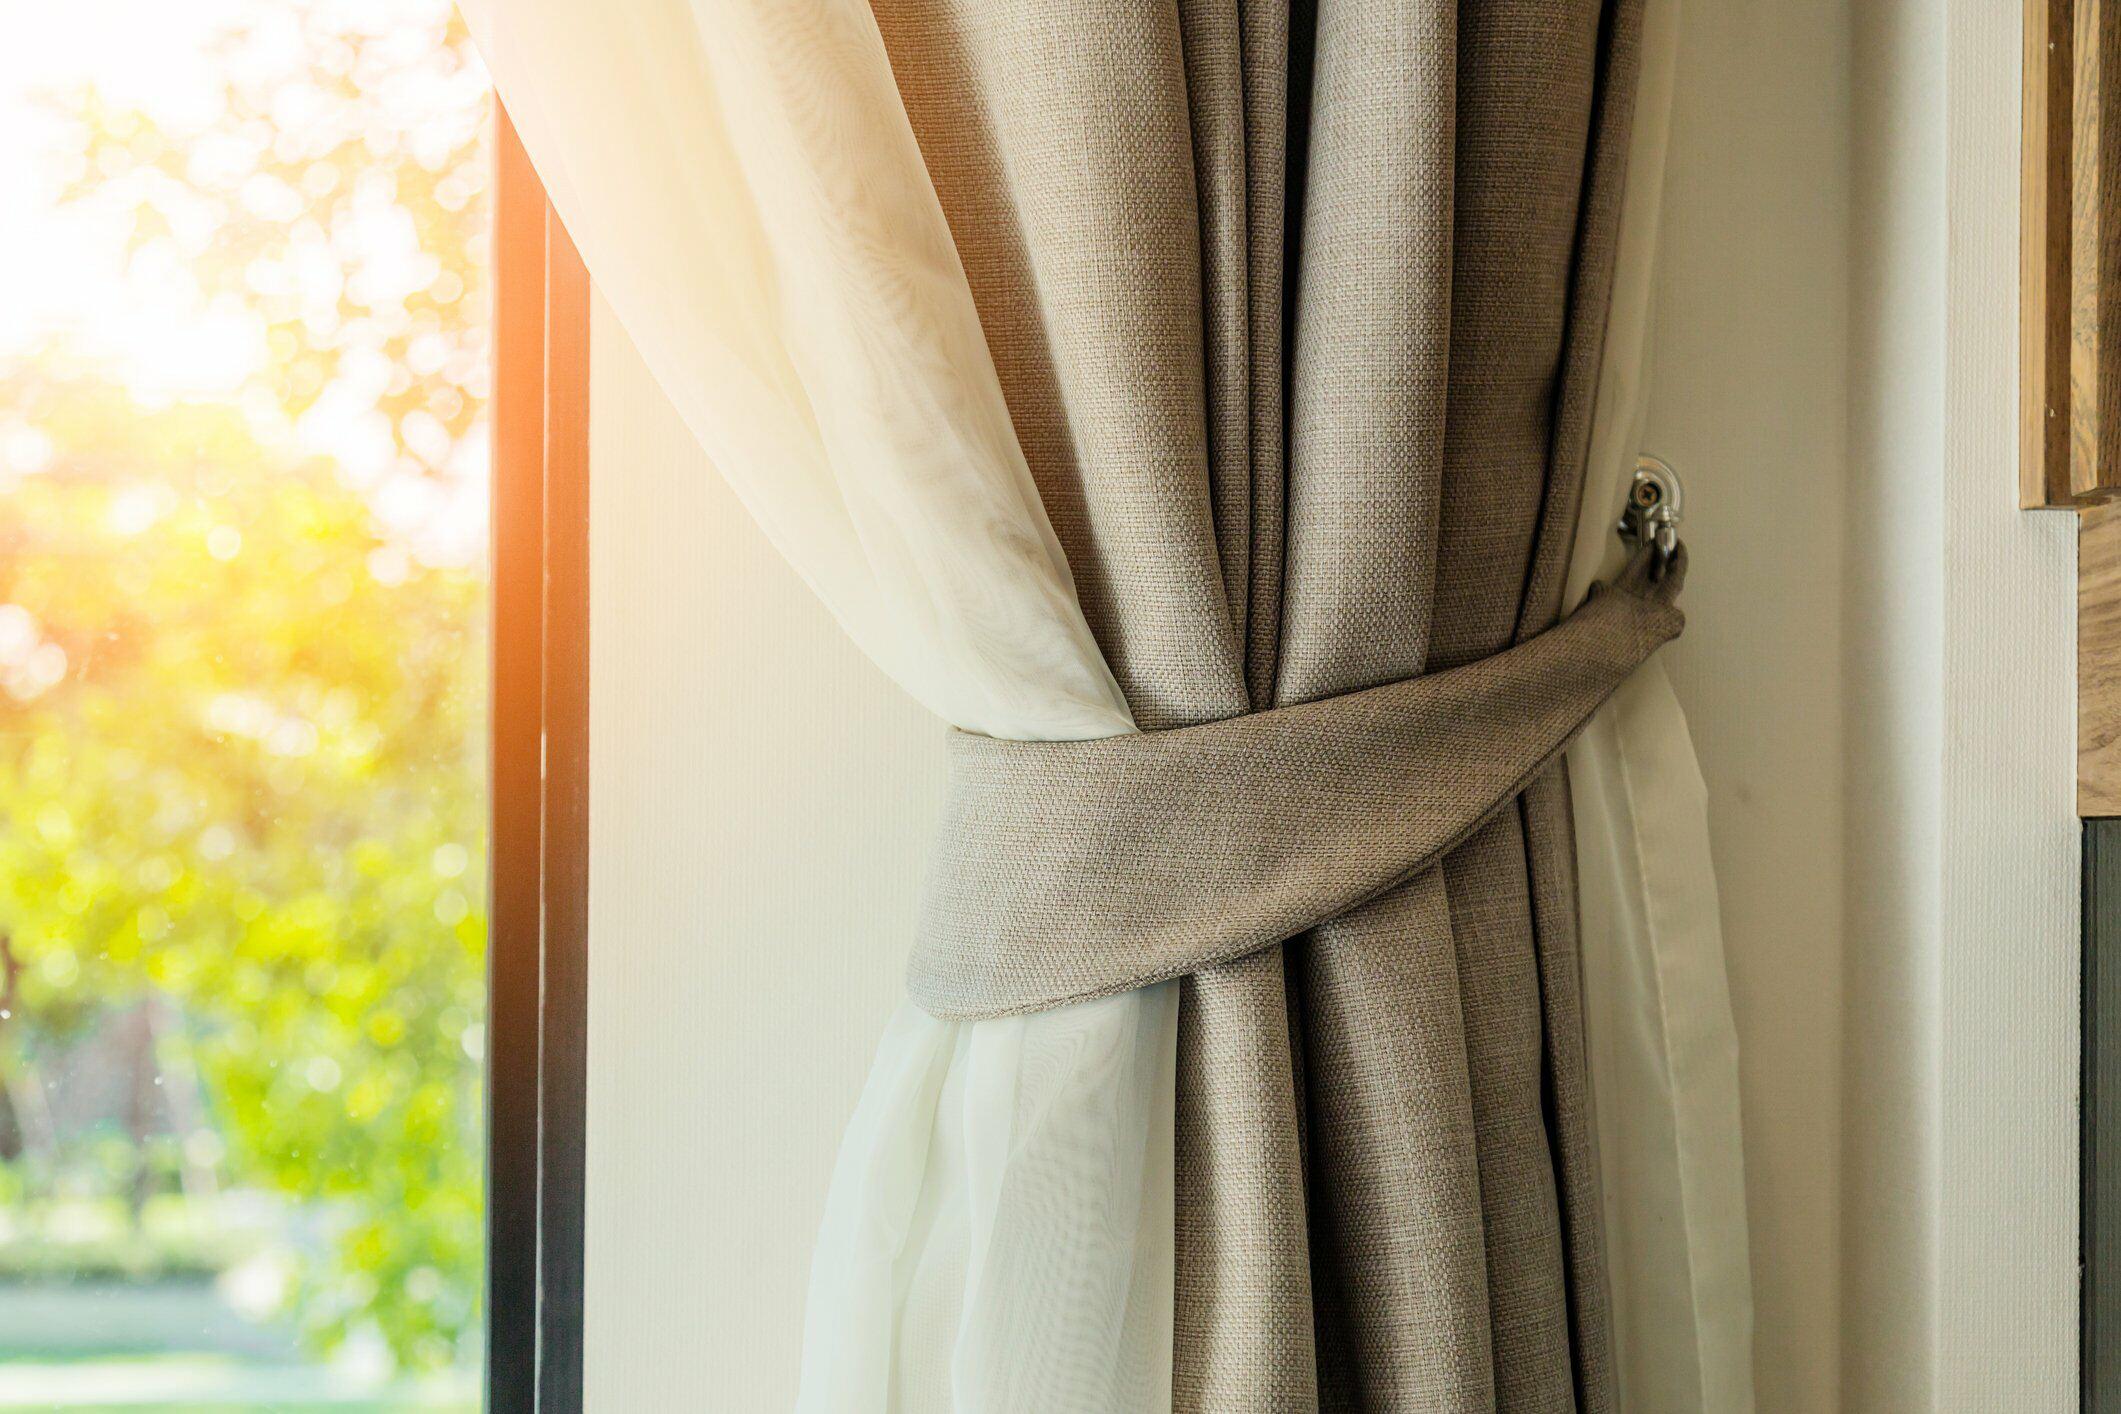 curtain cleaning London - Supreme Furnishings